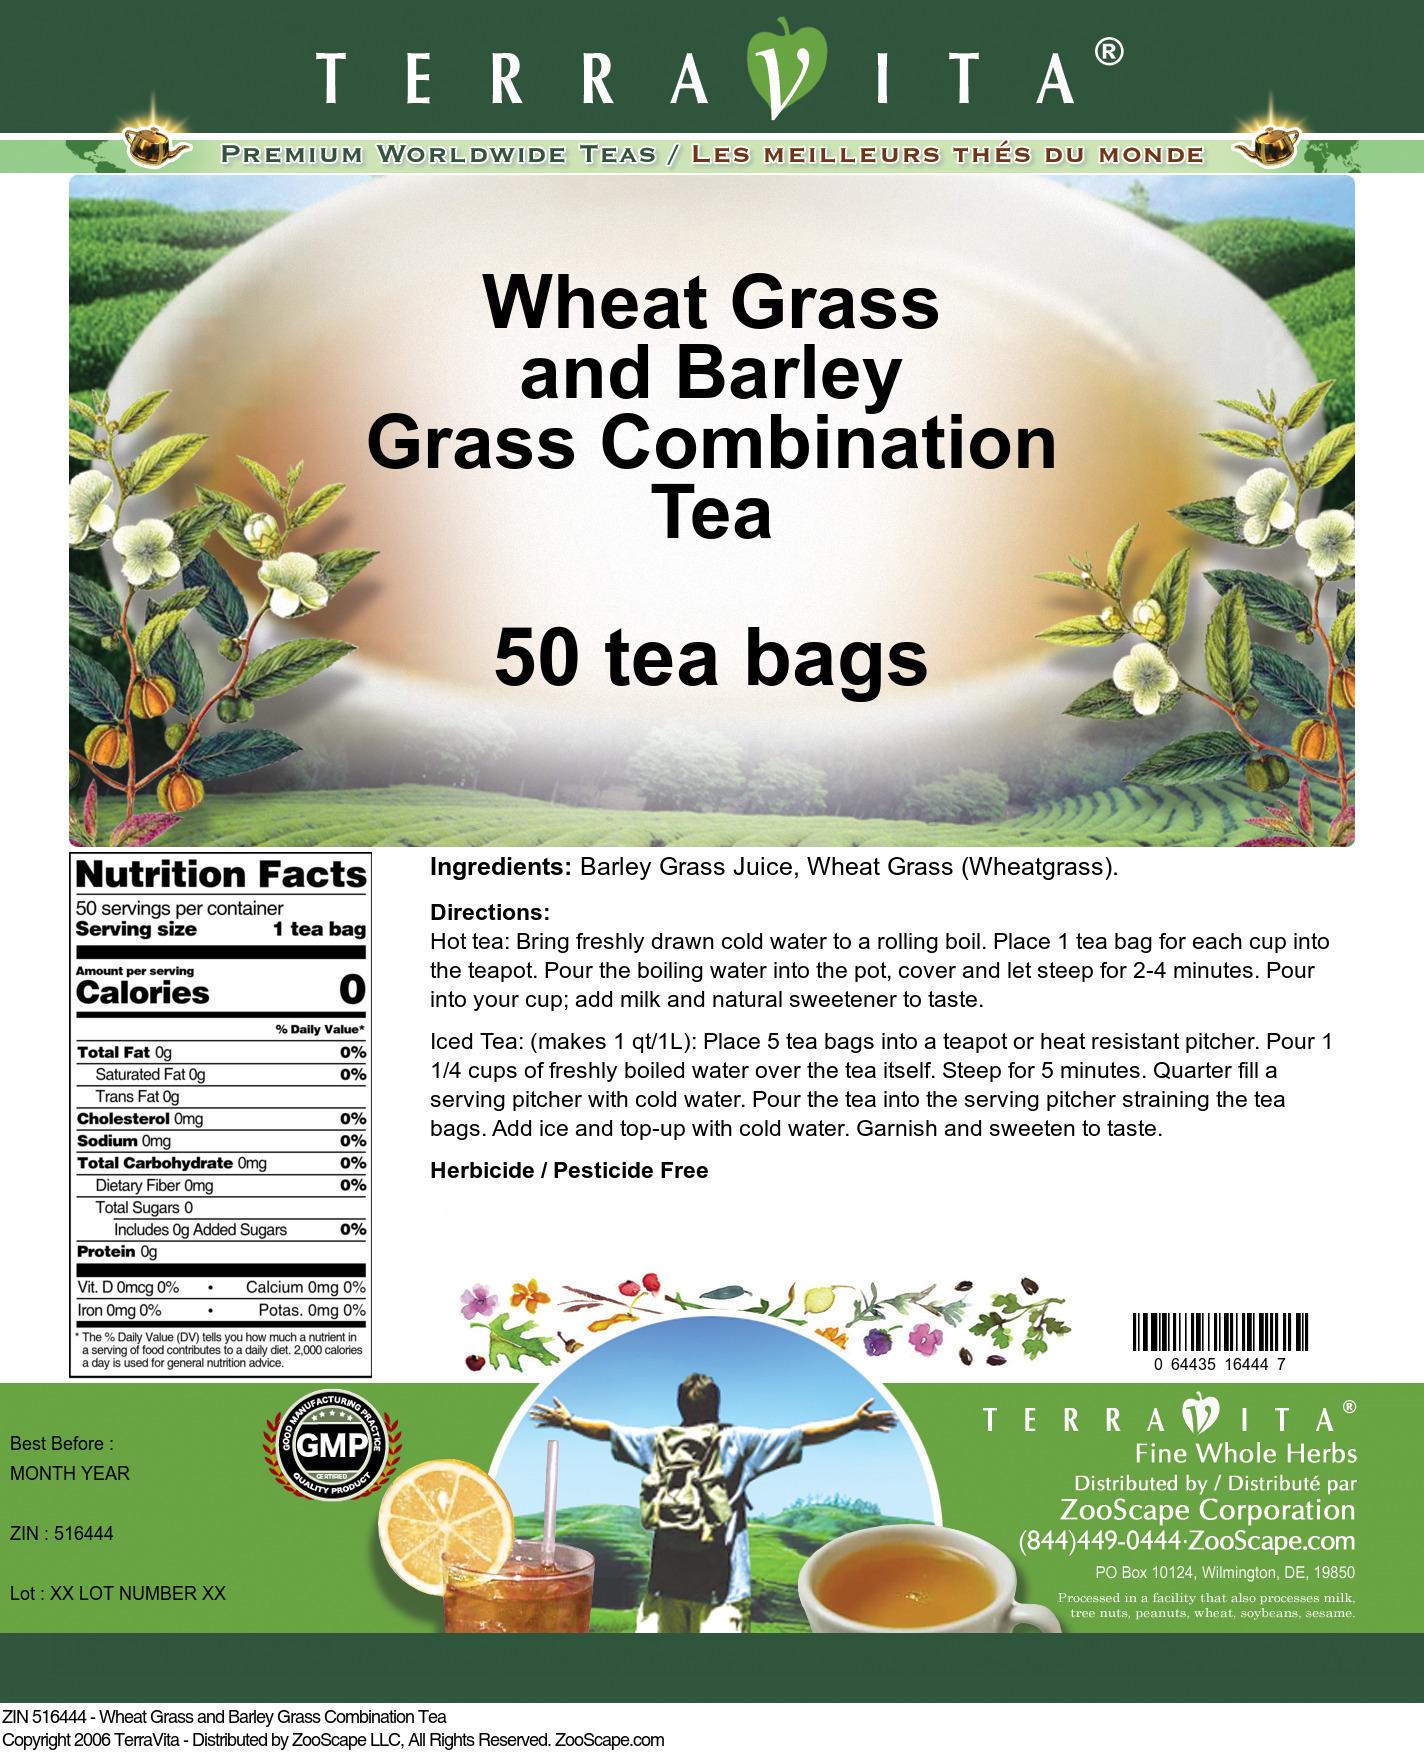 Wheat Grass and Barley Grass Combination Tea